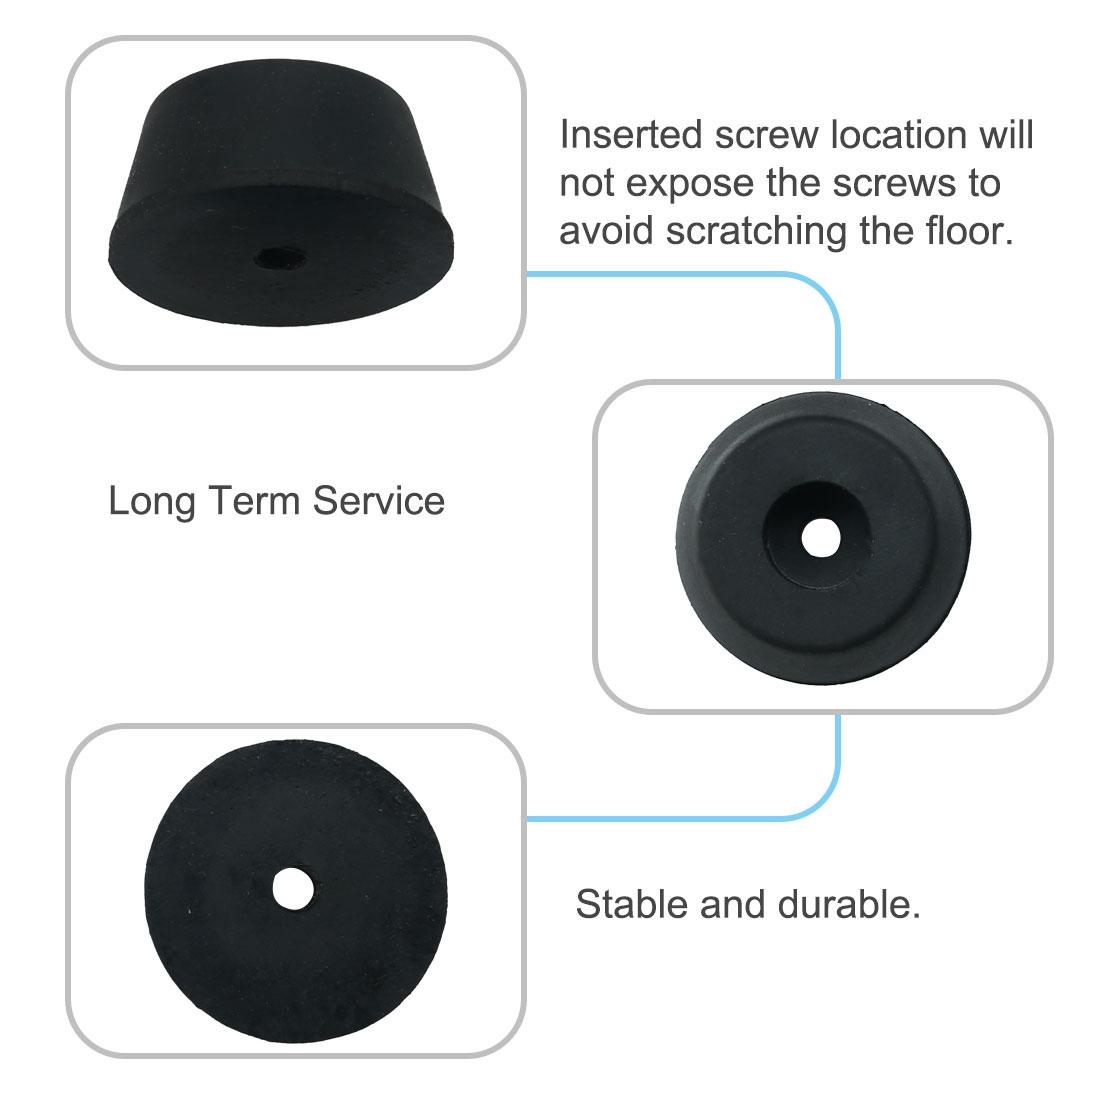 32pcs Rubber Feet Bumper Speaker Floor Protector for Desk Leg Pad, D14x12xH9mm - image 2 of 7